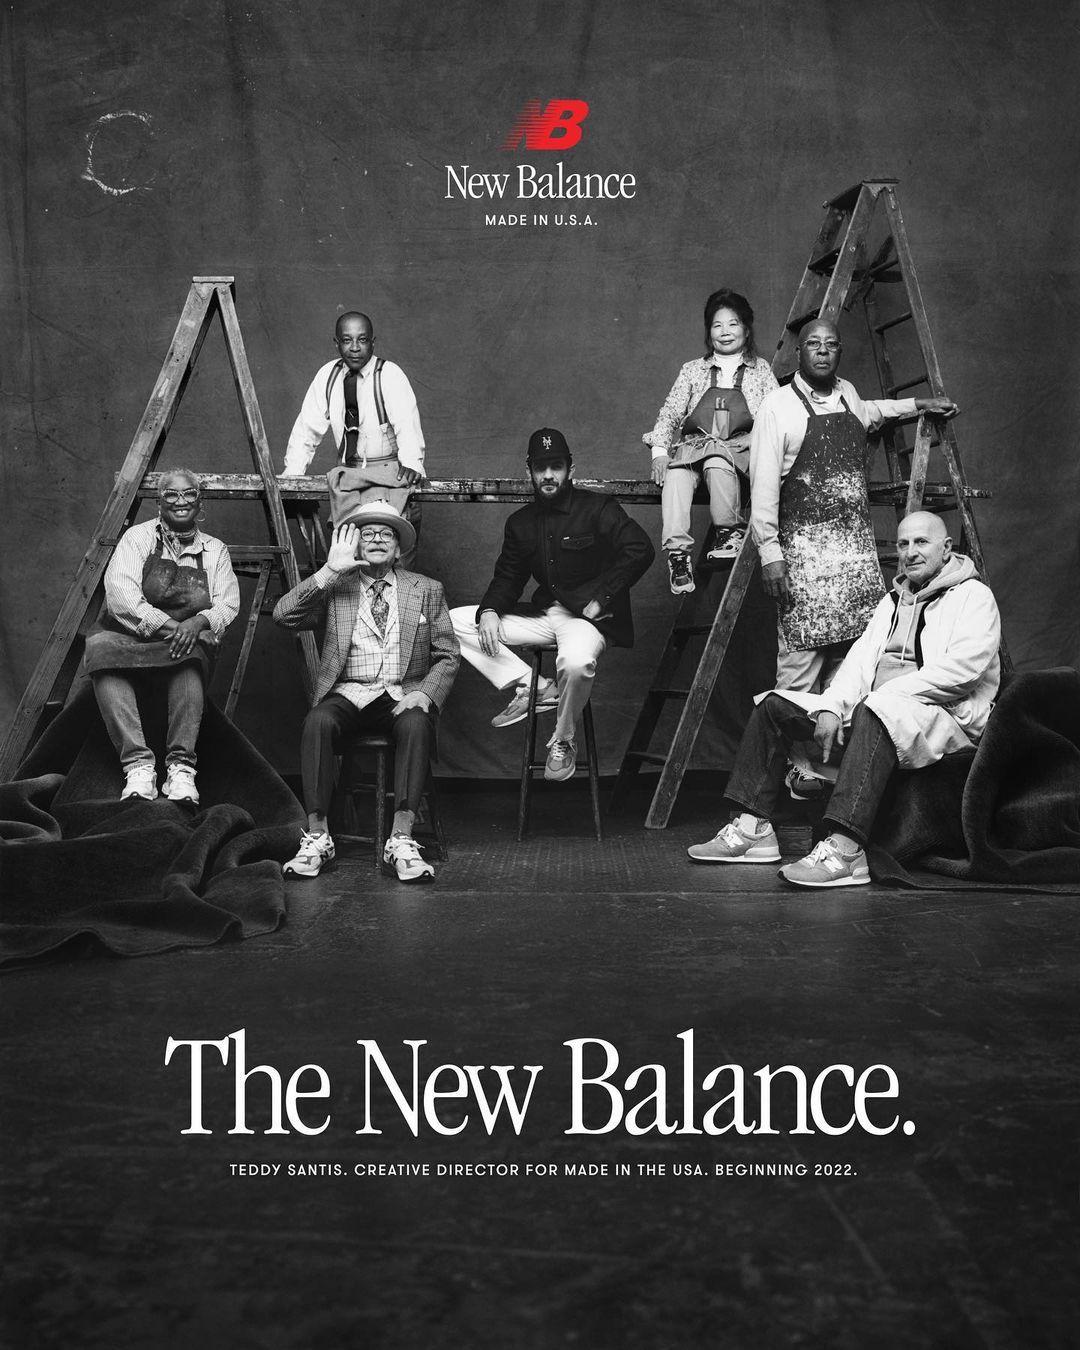 Teddy Santis nuevo director creativo de New Balance Made in USA